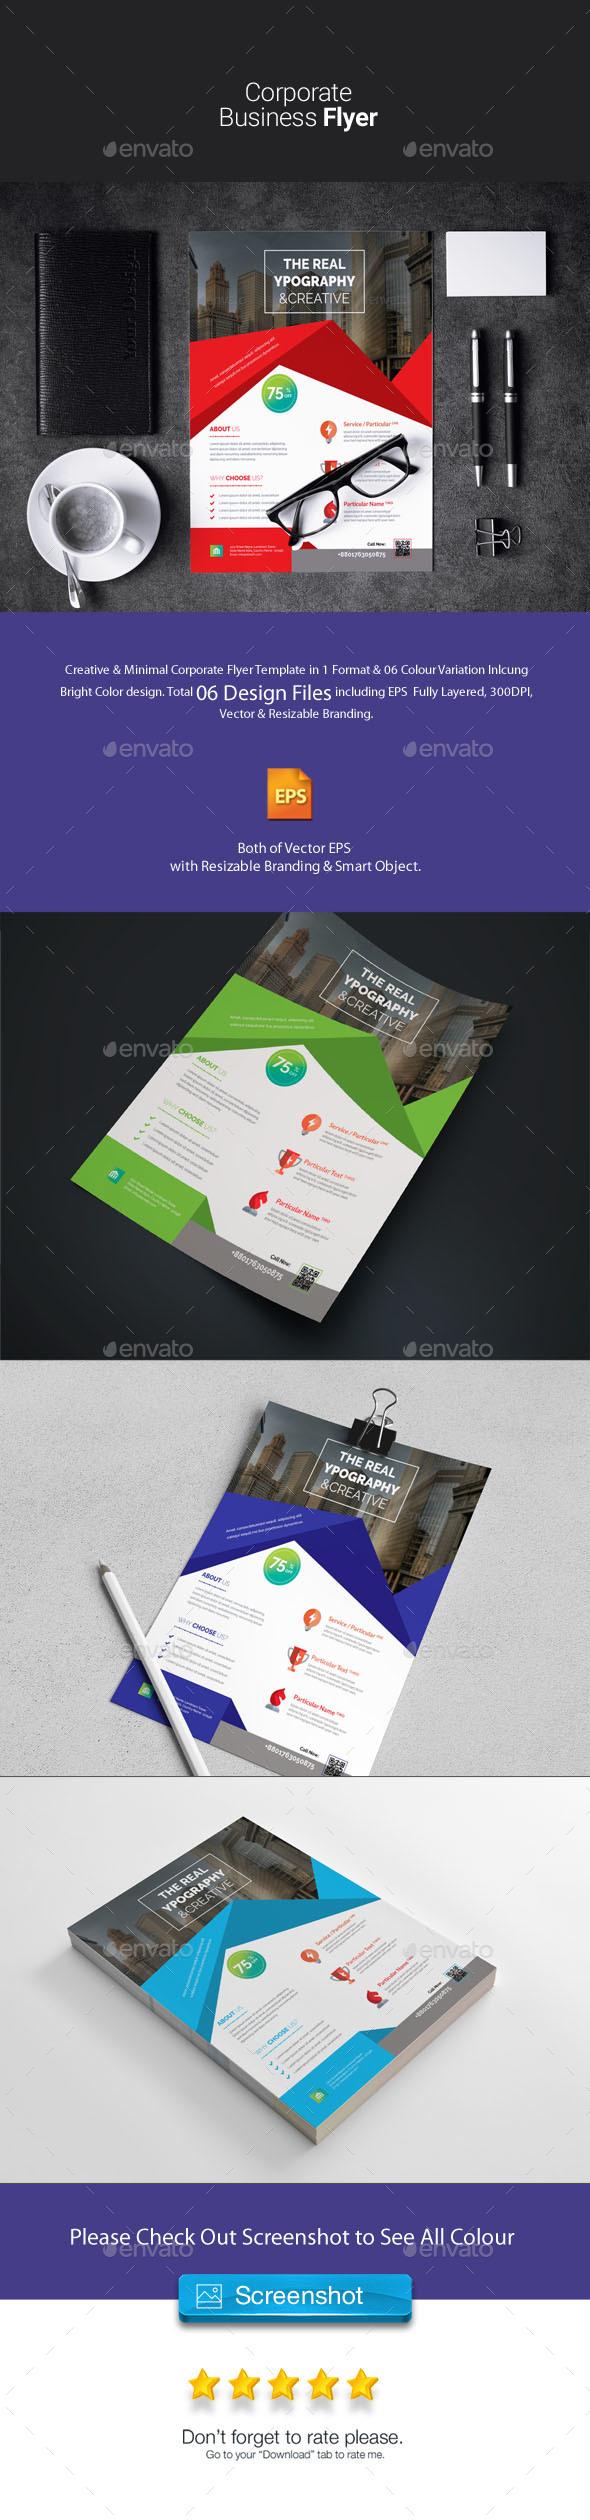 Corporate Flyer - Corporate Business Cards